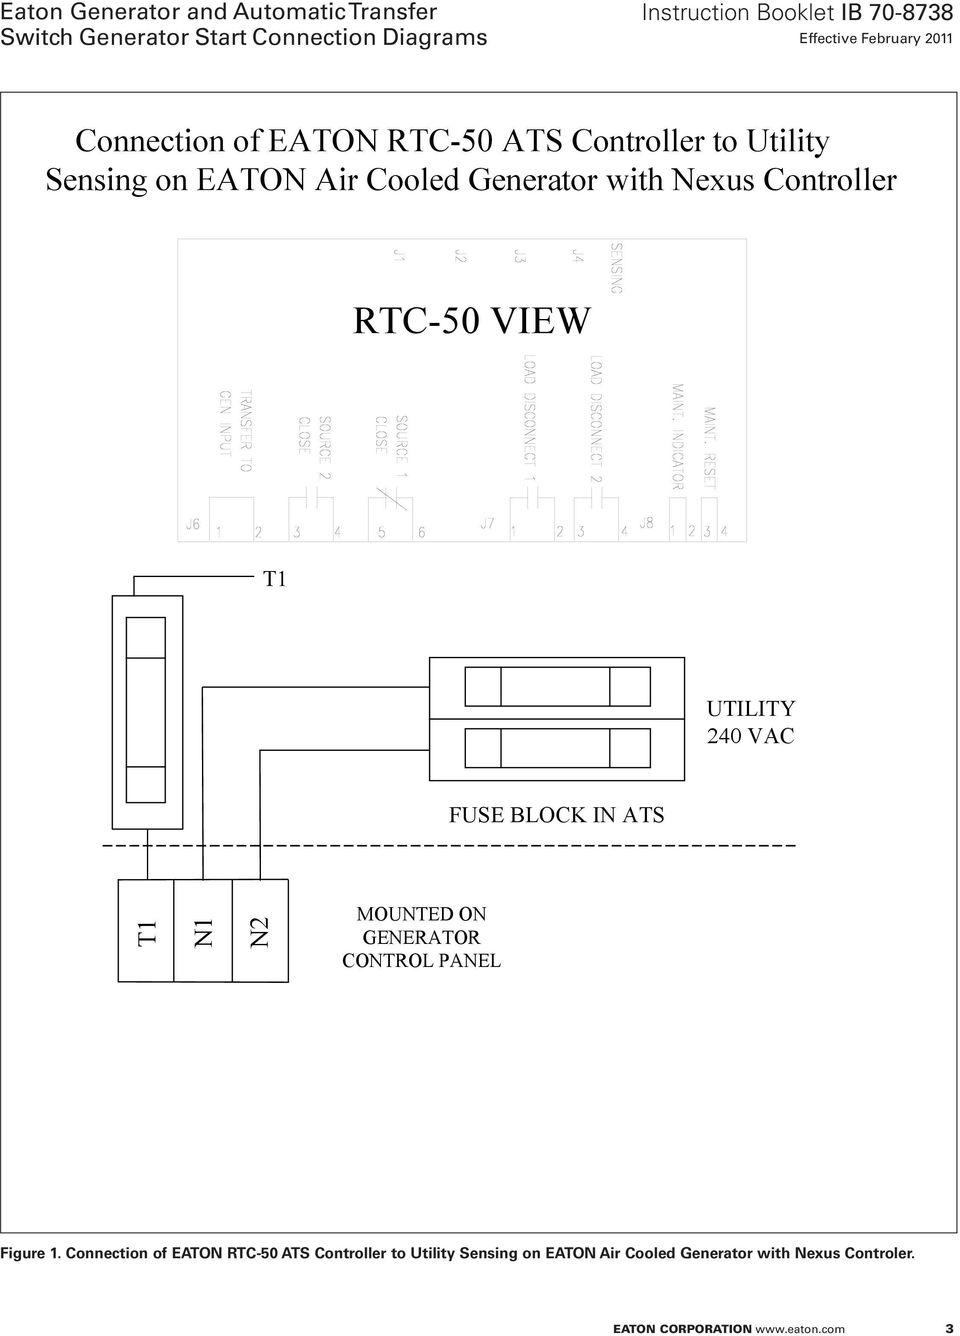 Campbell Hausfeld Generator Wiring Diagram Electrical Diagrams Air Compressor Sullair Trusted Welder